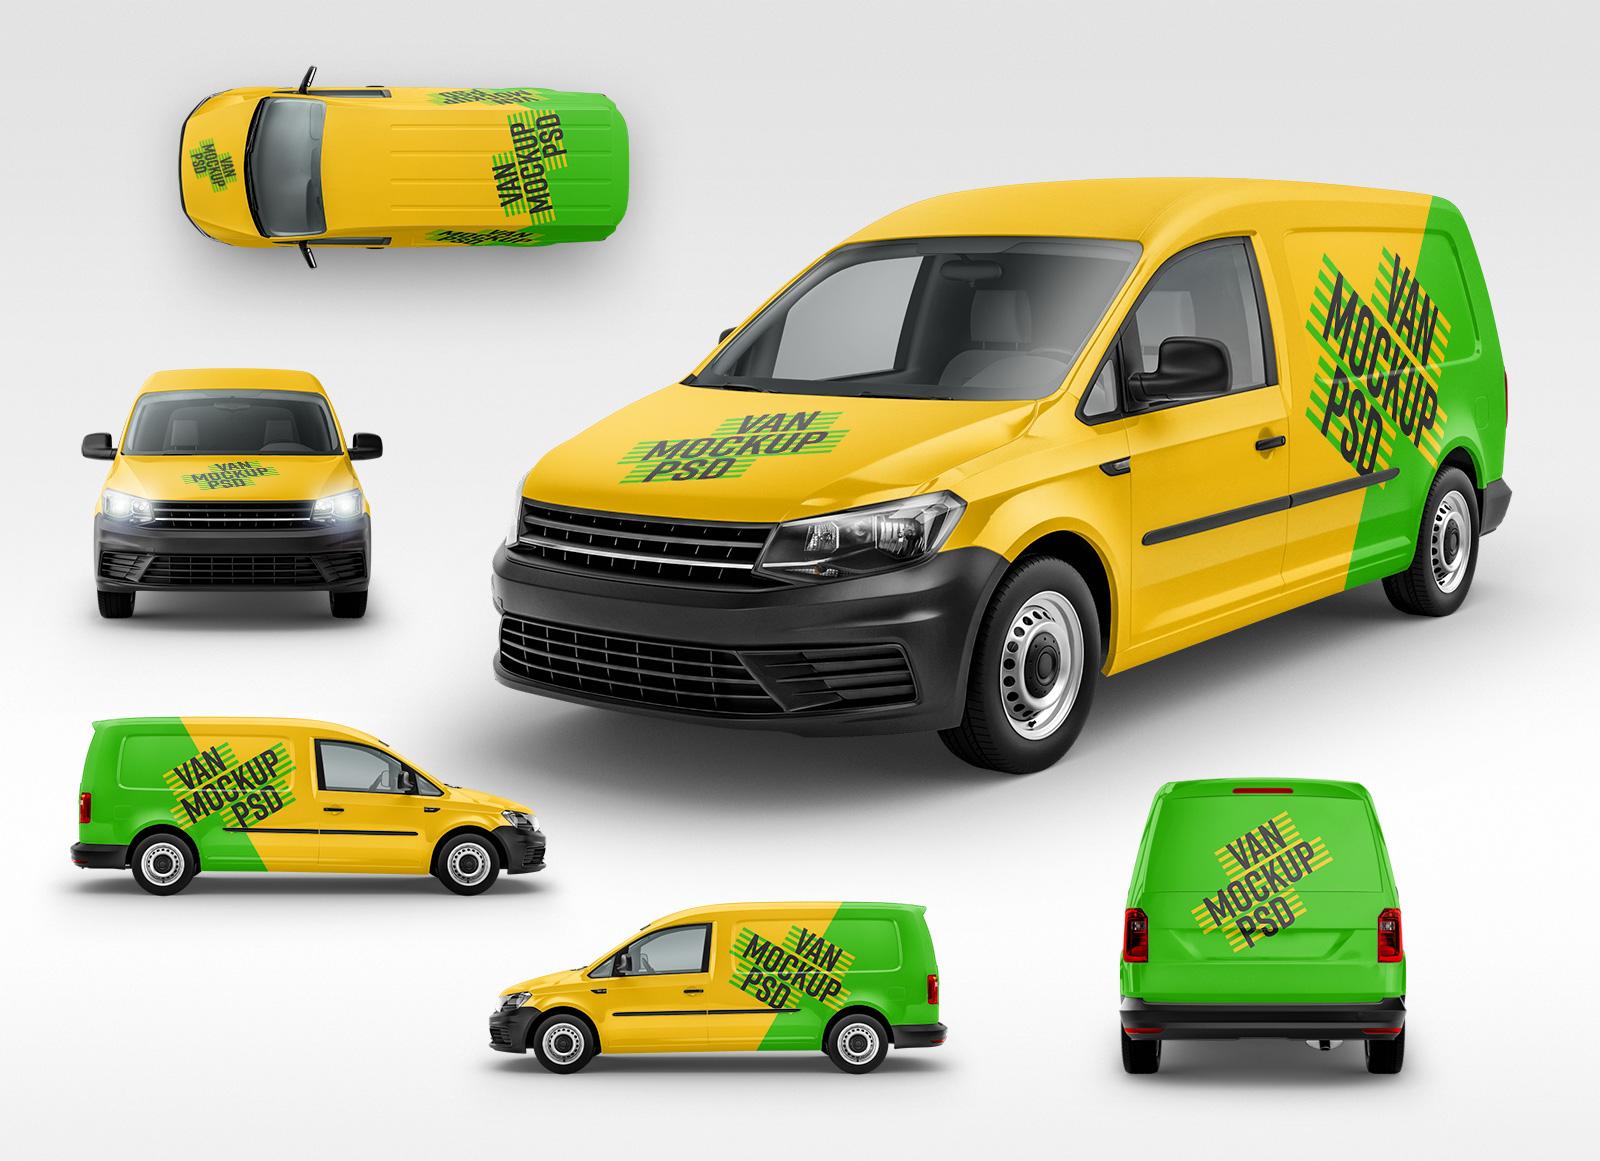 vehicle mockup psd free panel van vehicle branding mockup psd - good mockups